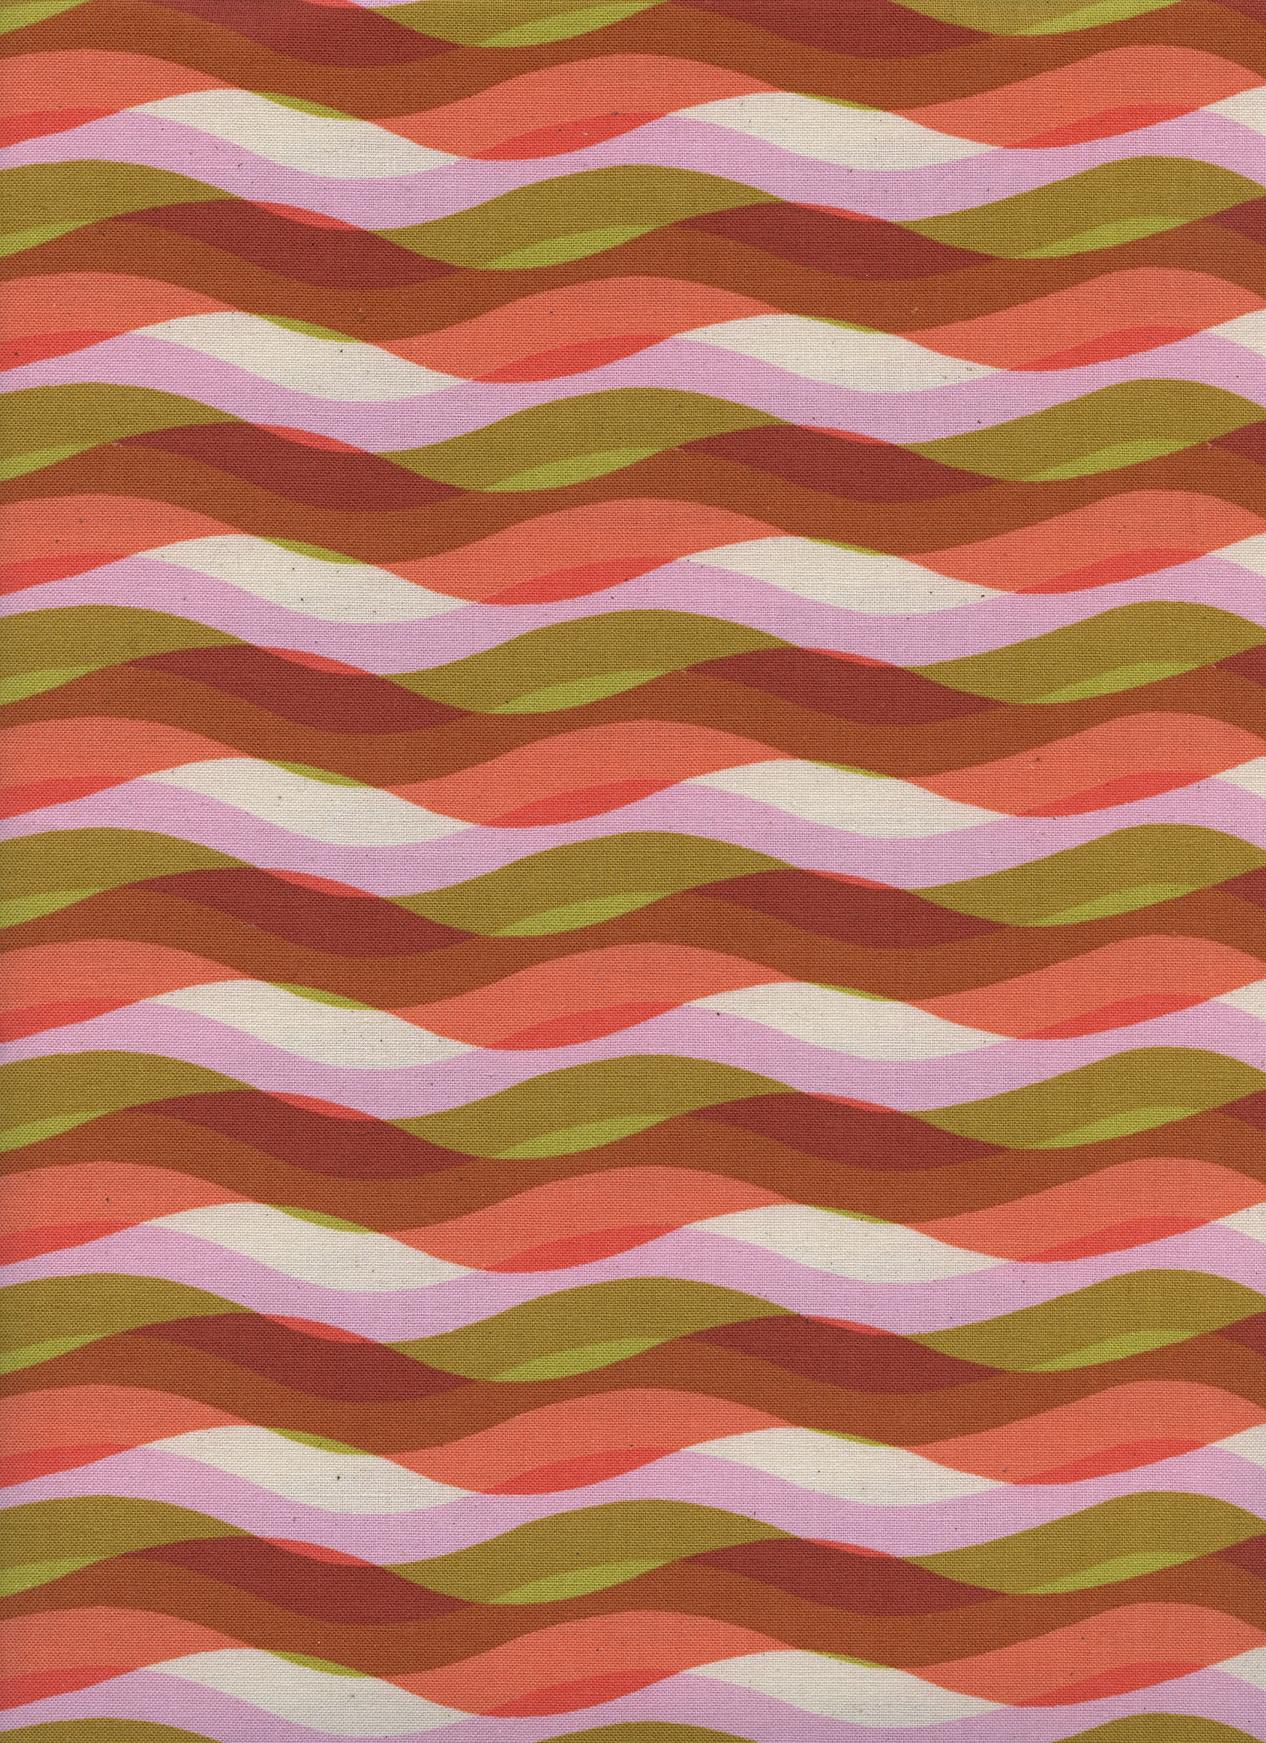 Cotton+Steel Poolside - Waves (Pink)